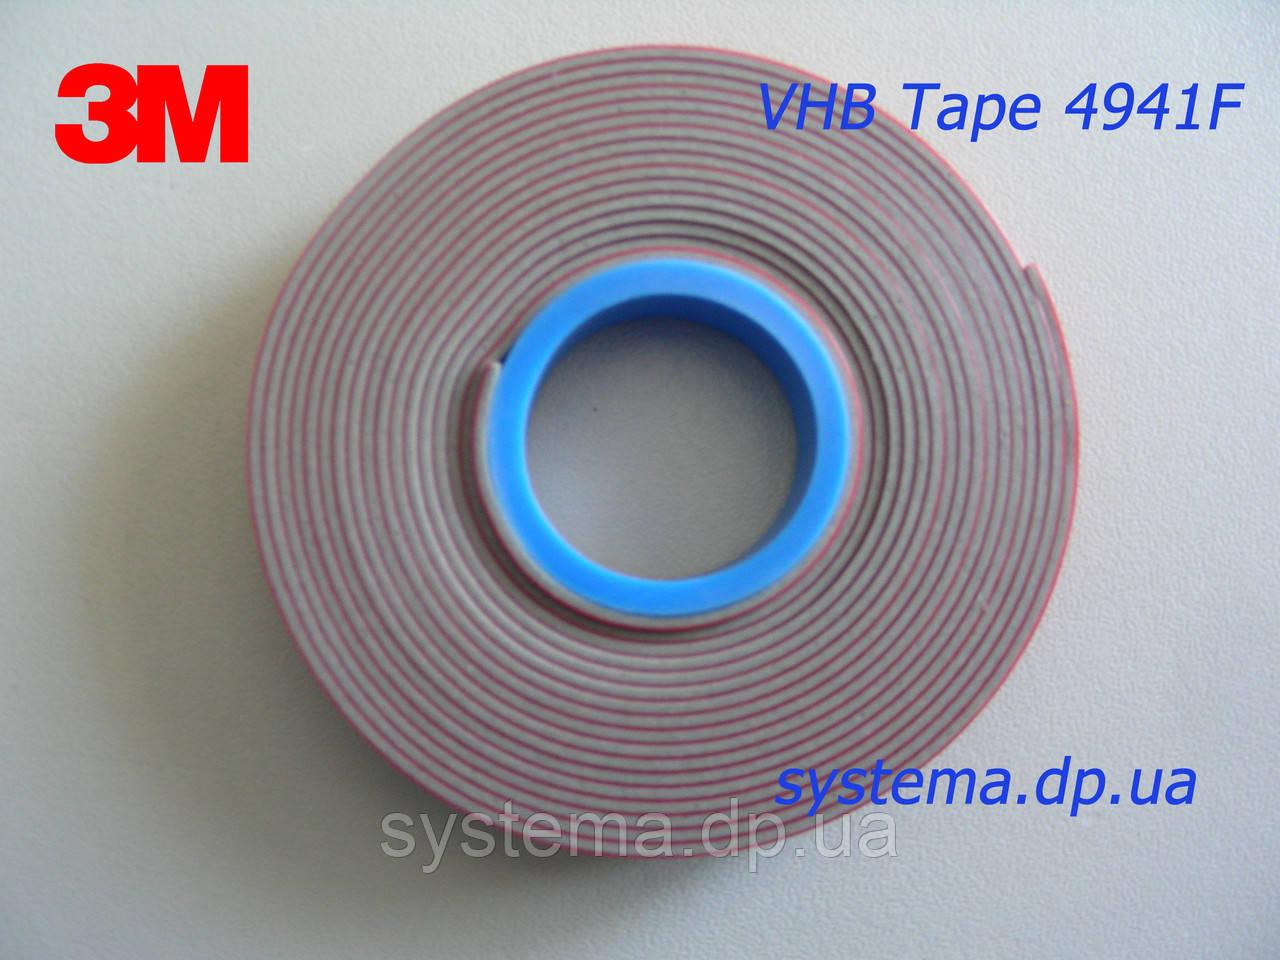 3M™ VHB™ 4941F - Двухсторонний монтажный скотч 3M (акриловый клей в ленте), 6,0х1,1 мм, рулон 5 м